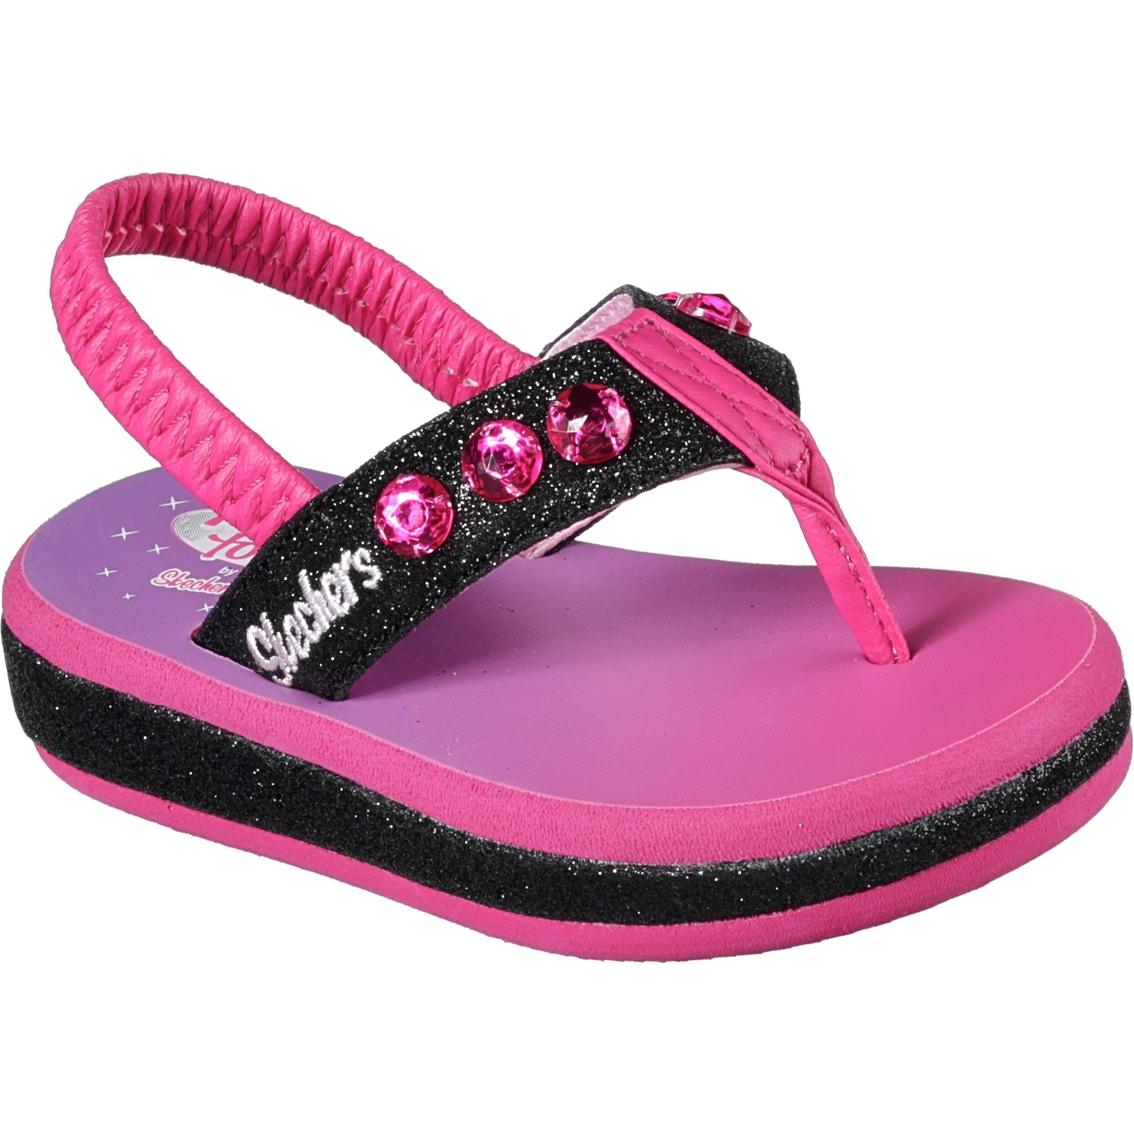 ce1025776978 Skechers Toddler Girls Twinkle Toe Sunshine Sandals